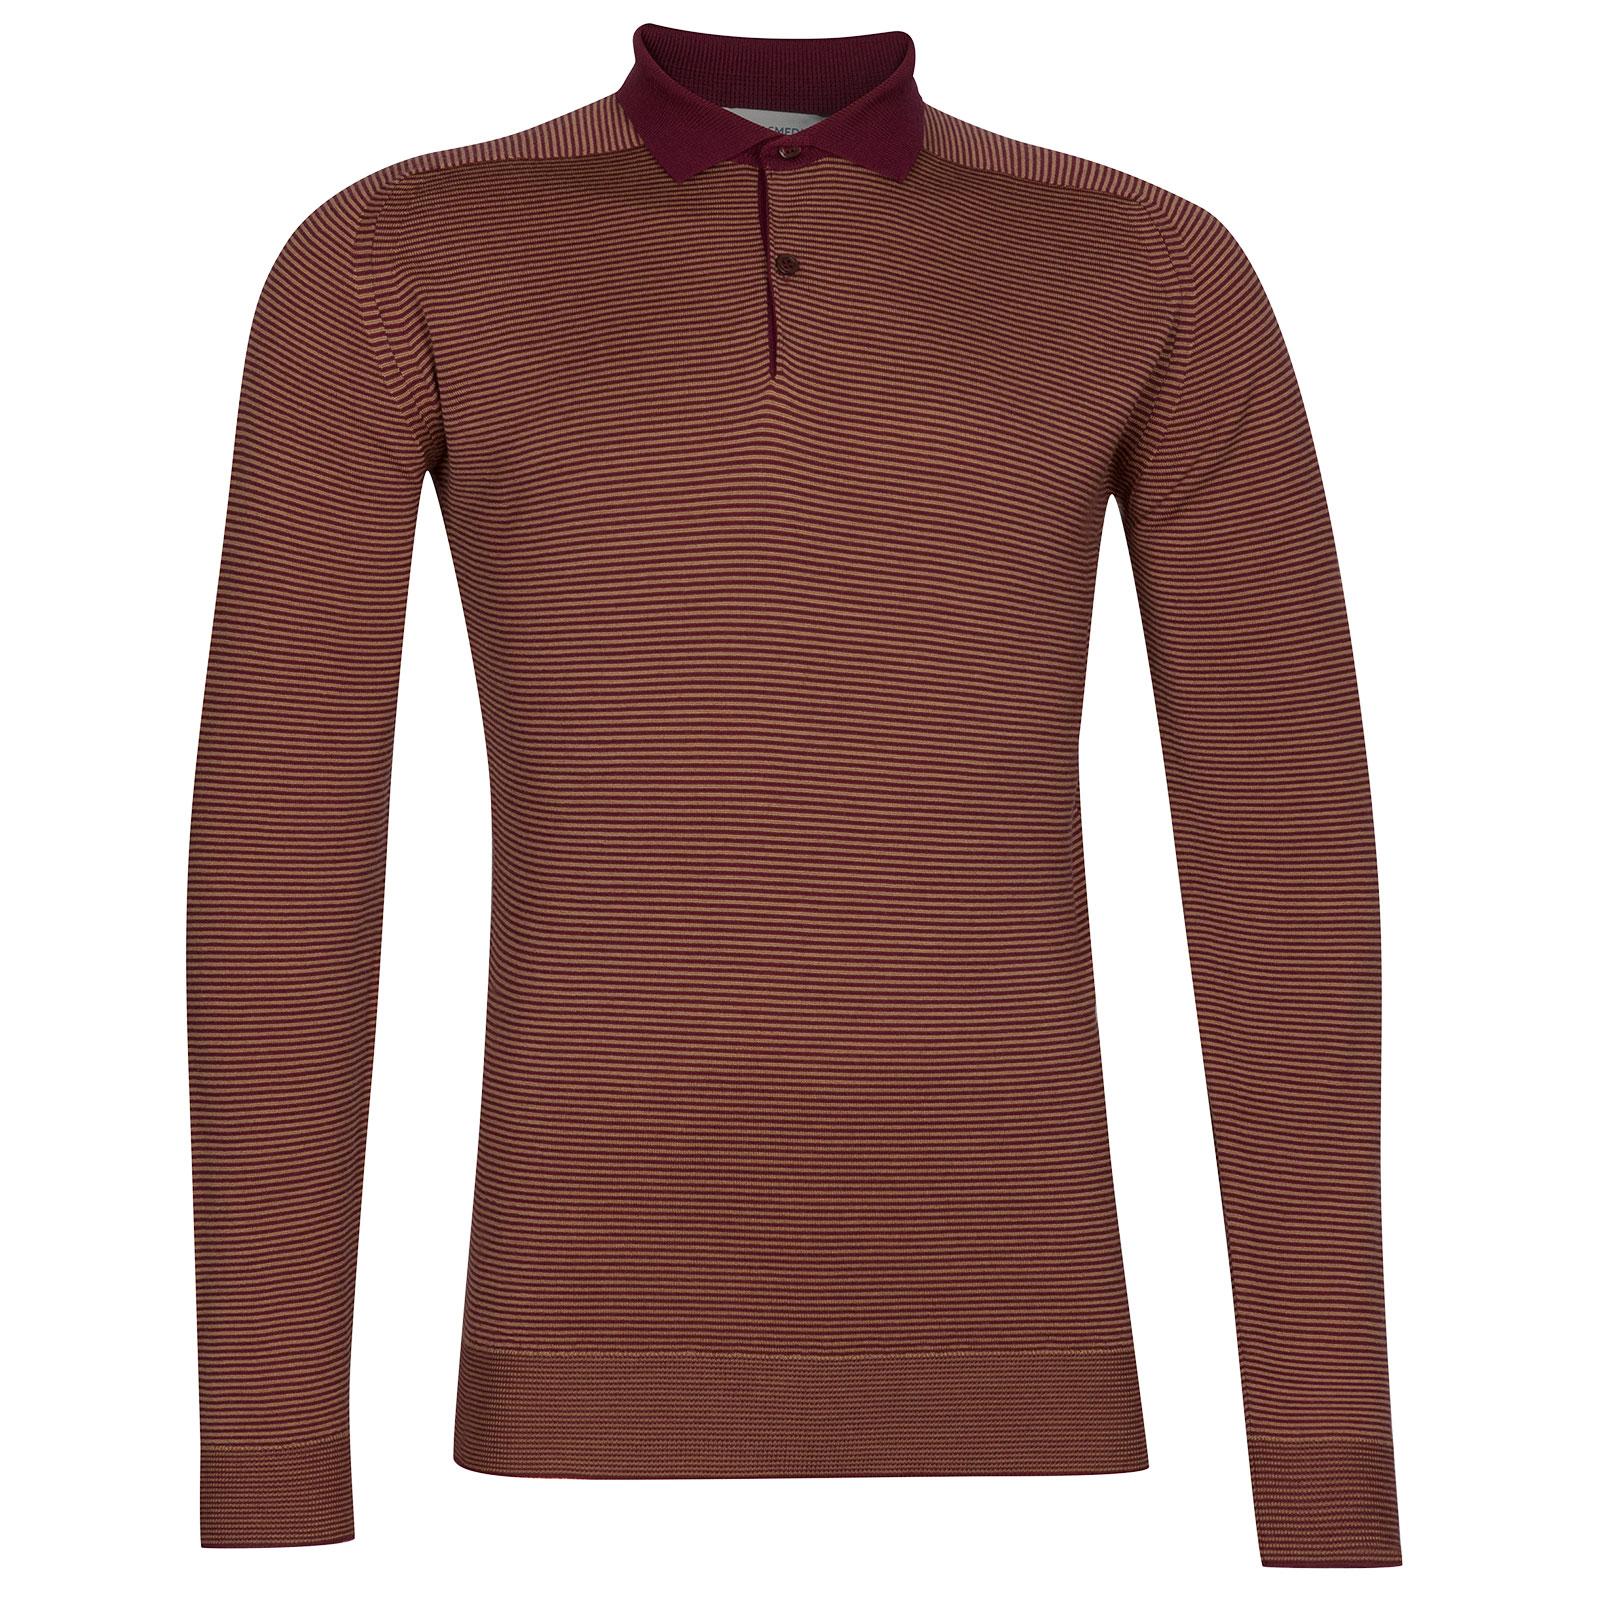 John Smedley Bunson Extra Fine Merino Shirt in Bordeaux-L